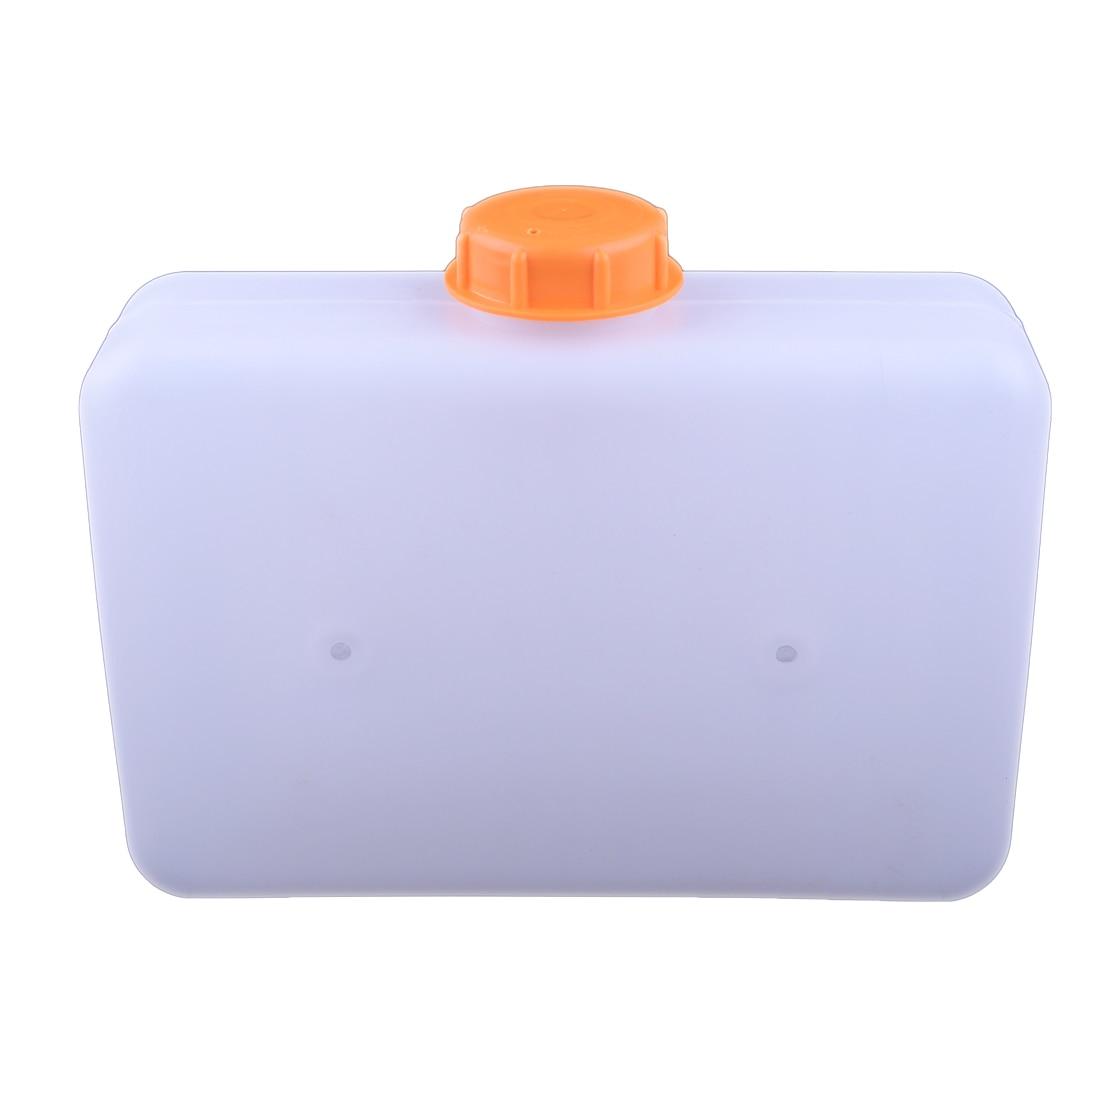 CITALL 5L Capacity White Plastic Parking Heater Fuel Tank for Webasto Eberspacher